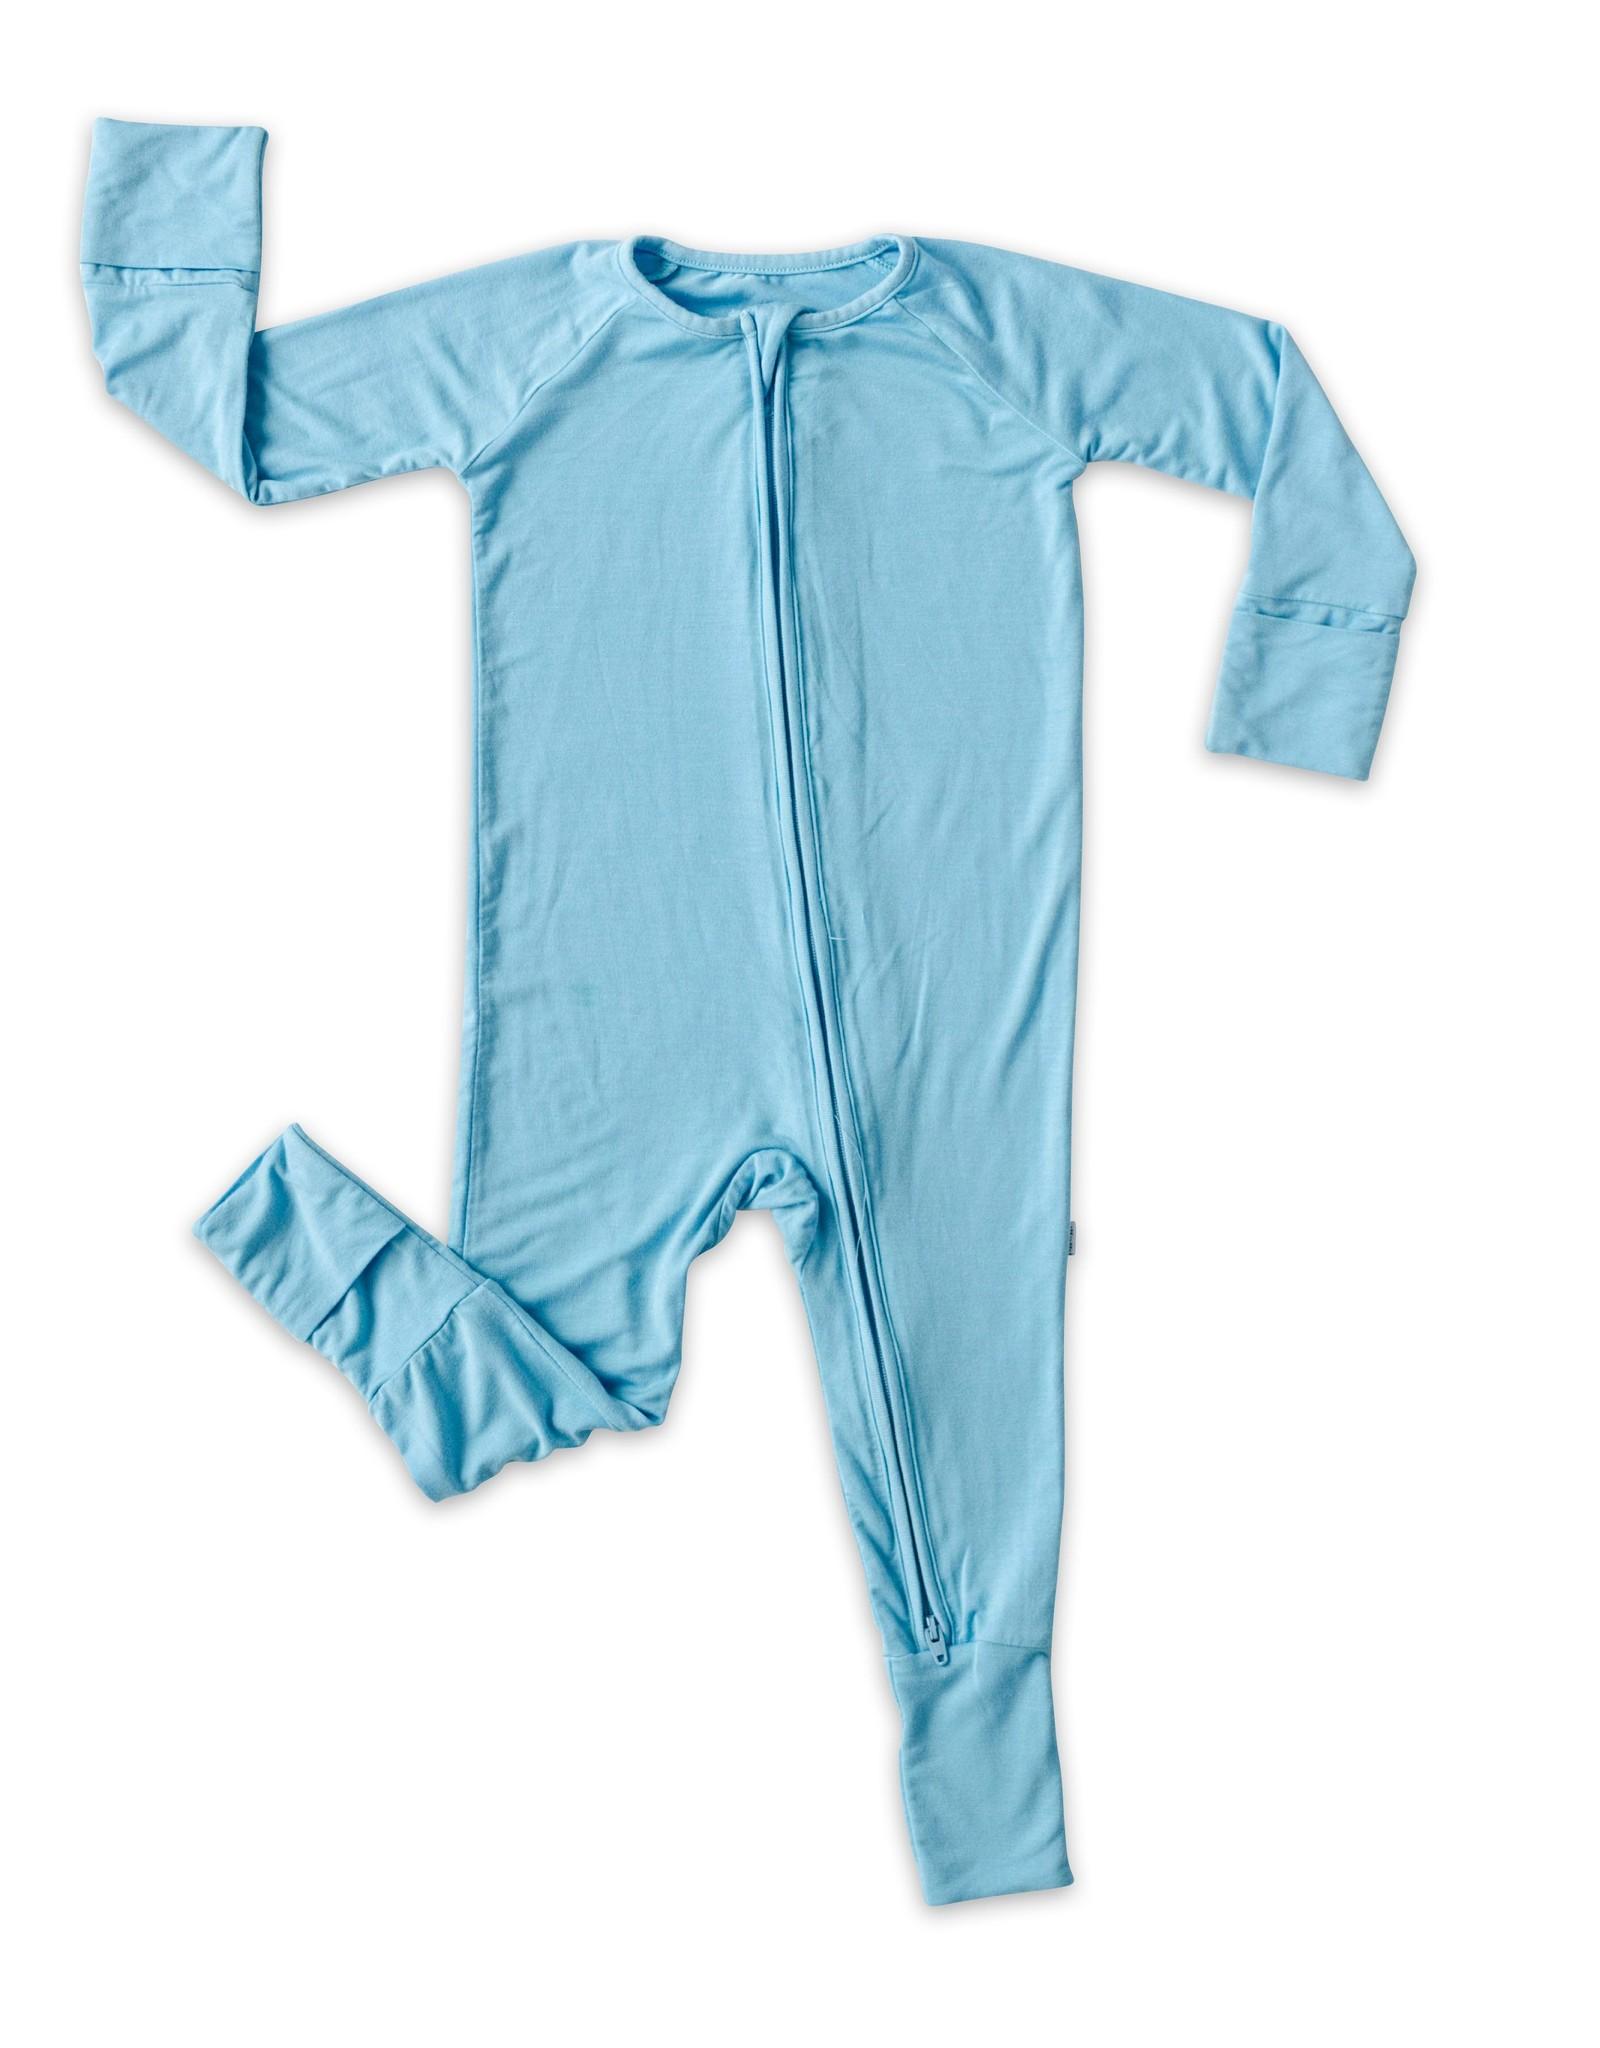 Little Sleepies sky blue zippy